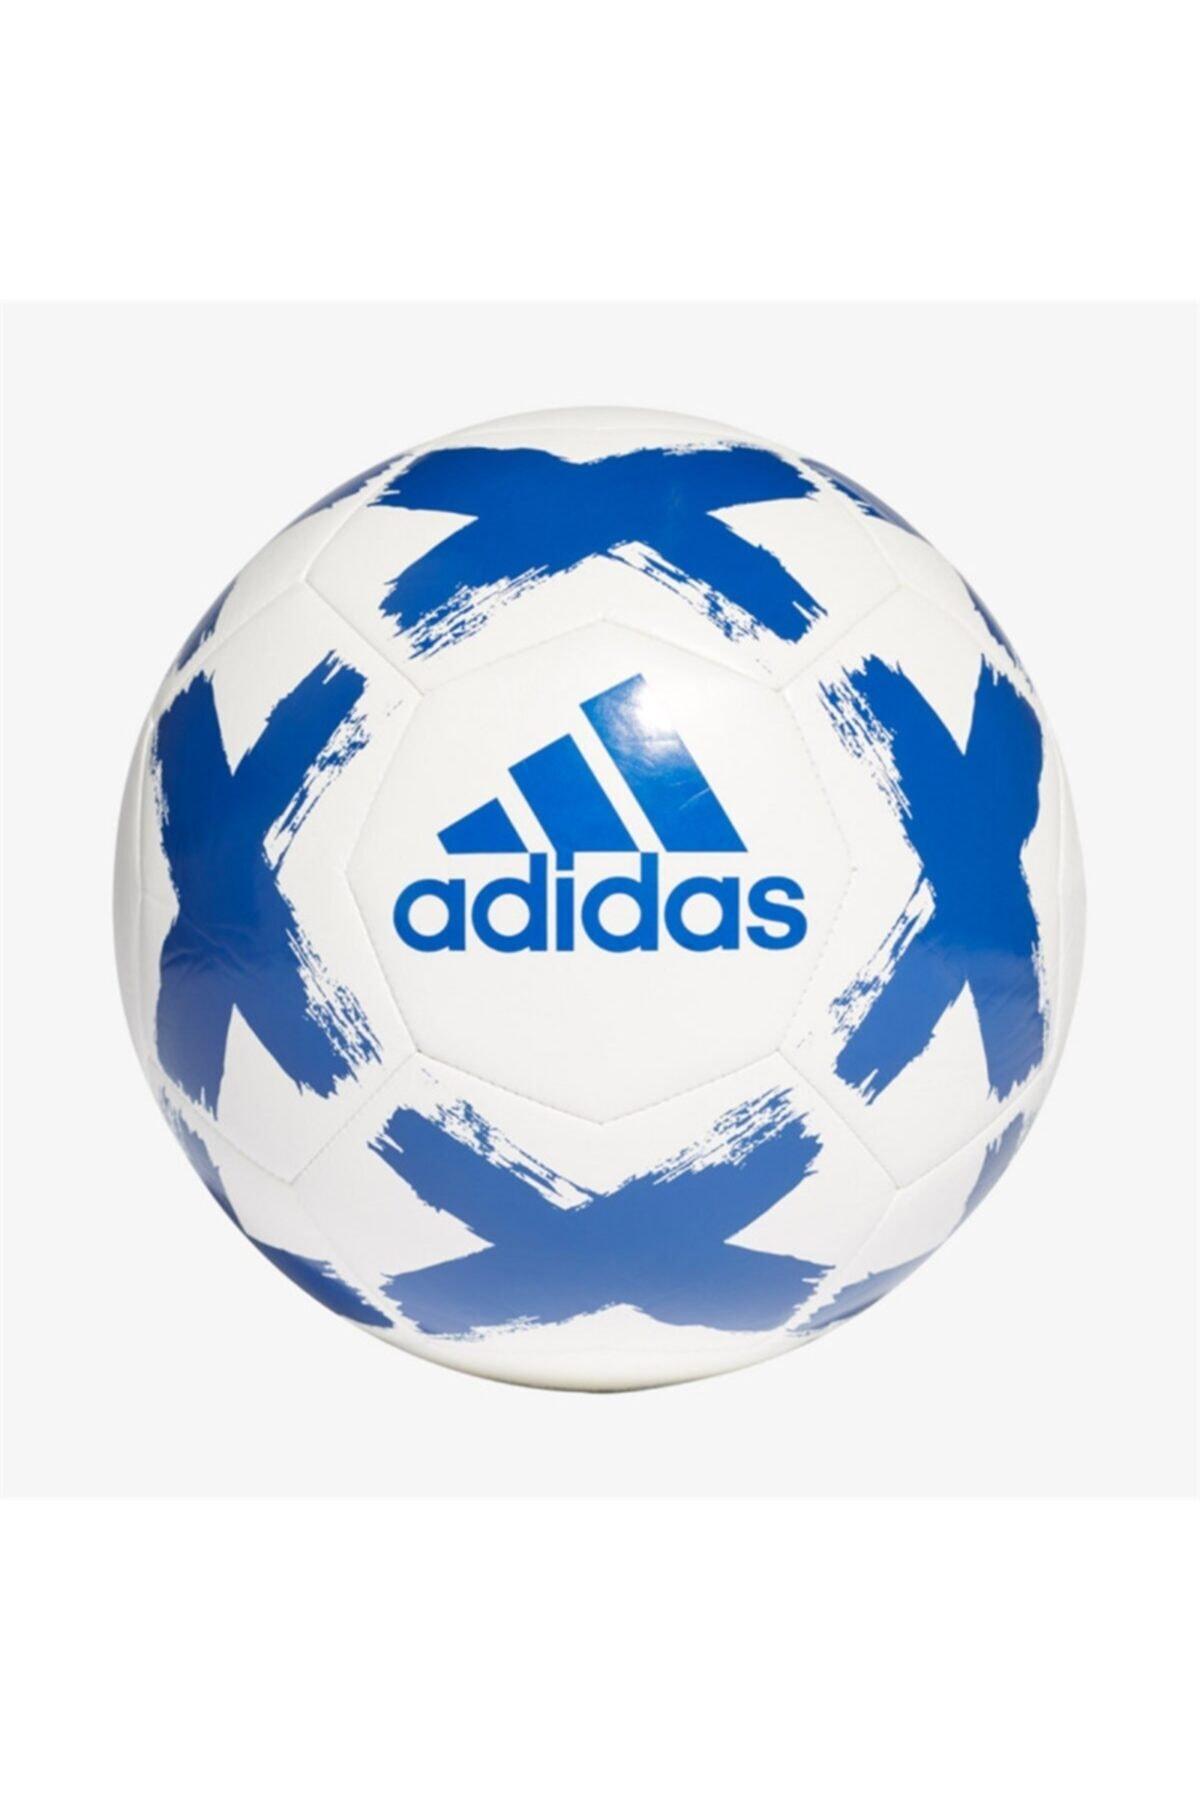 adidas Starlancer Clb Futbol Topu 1